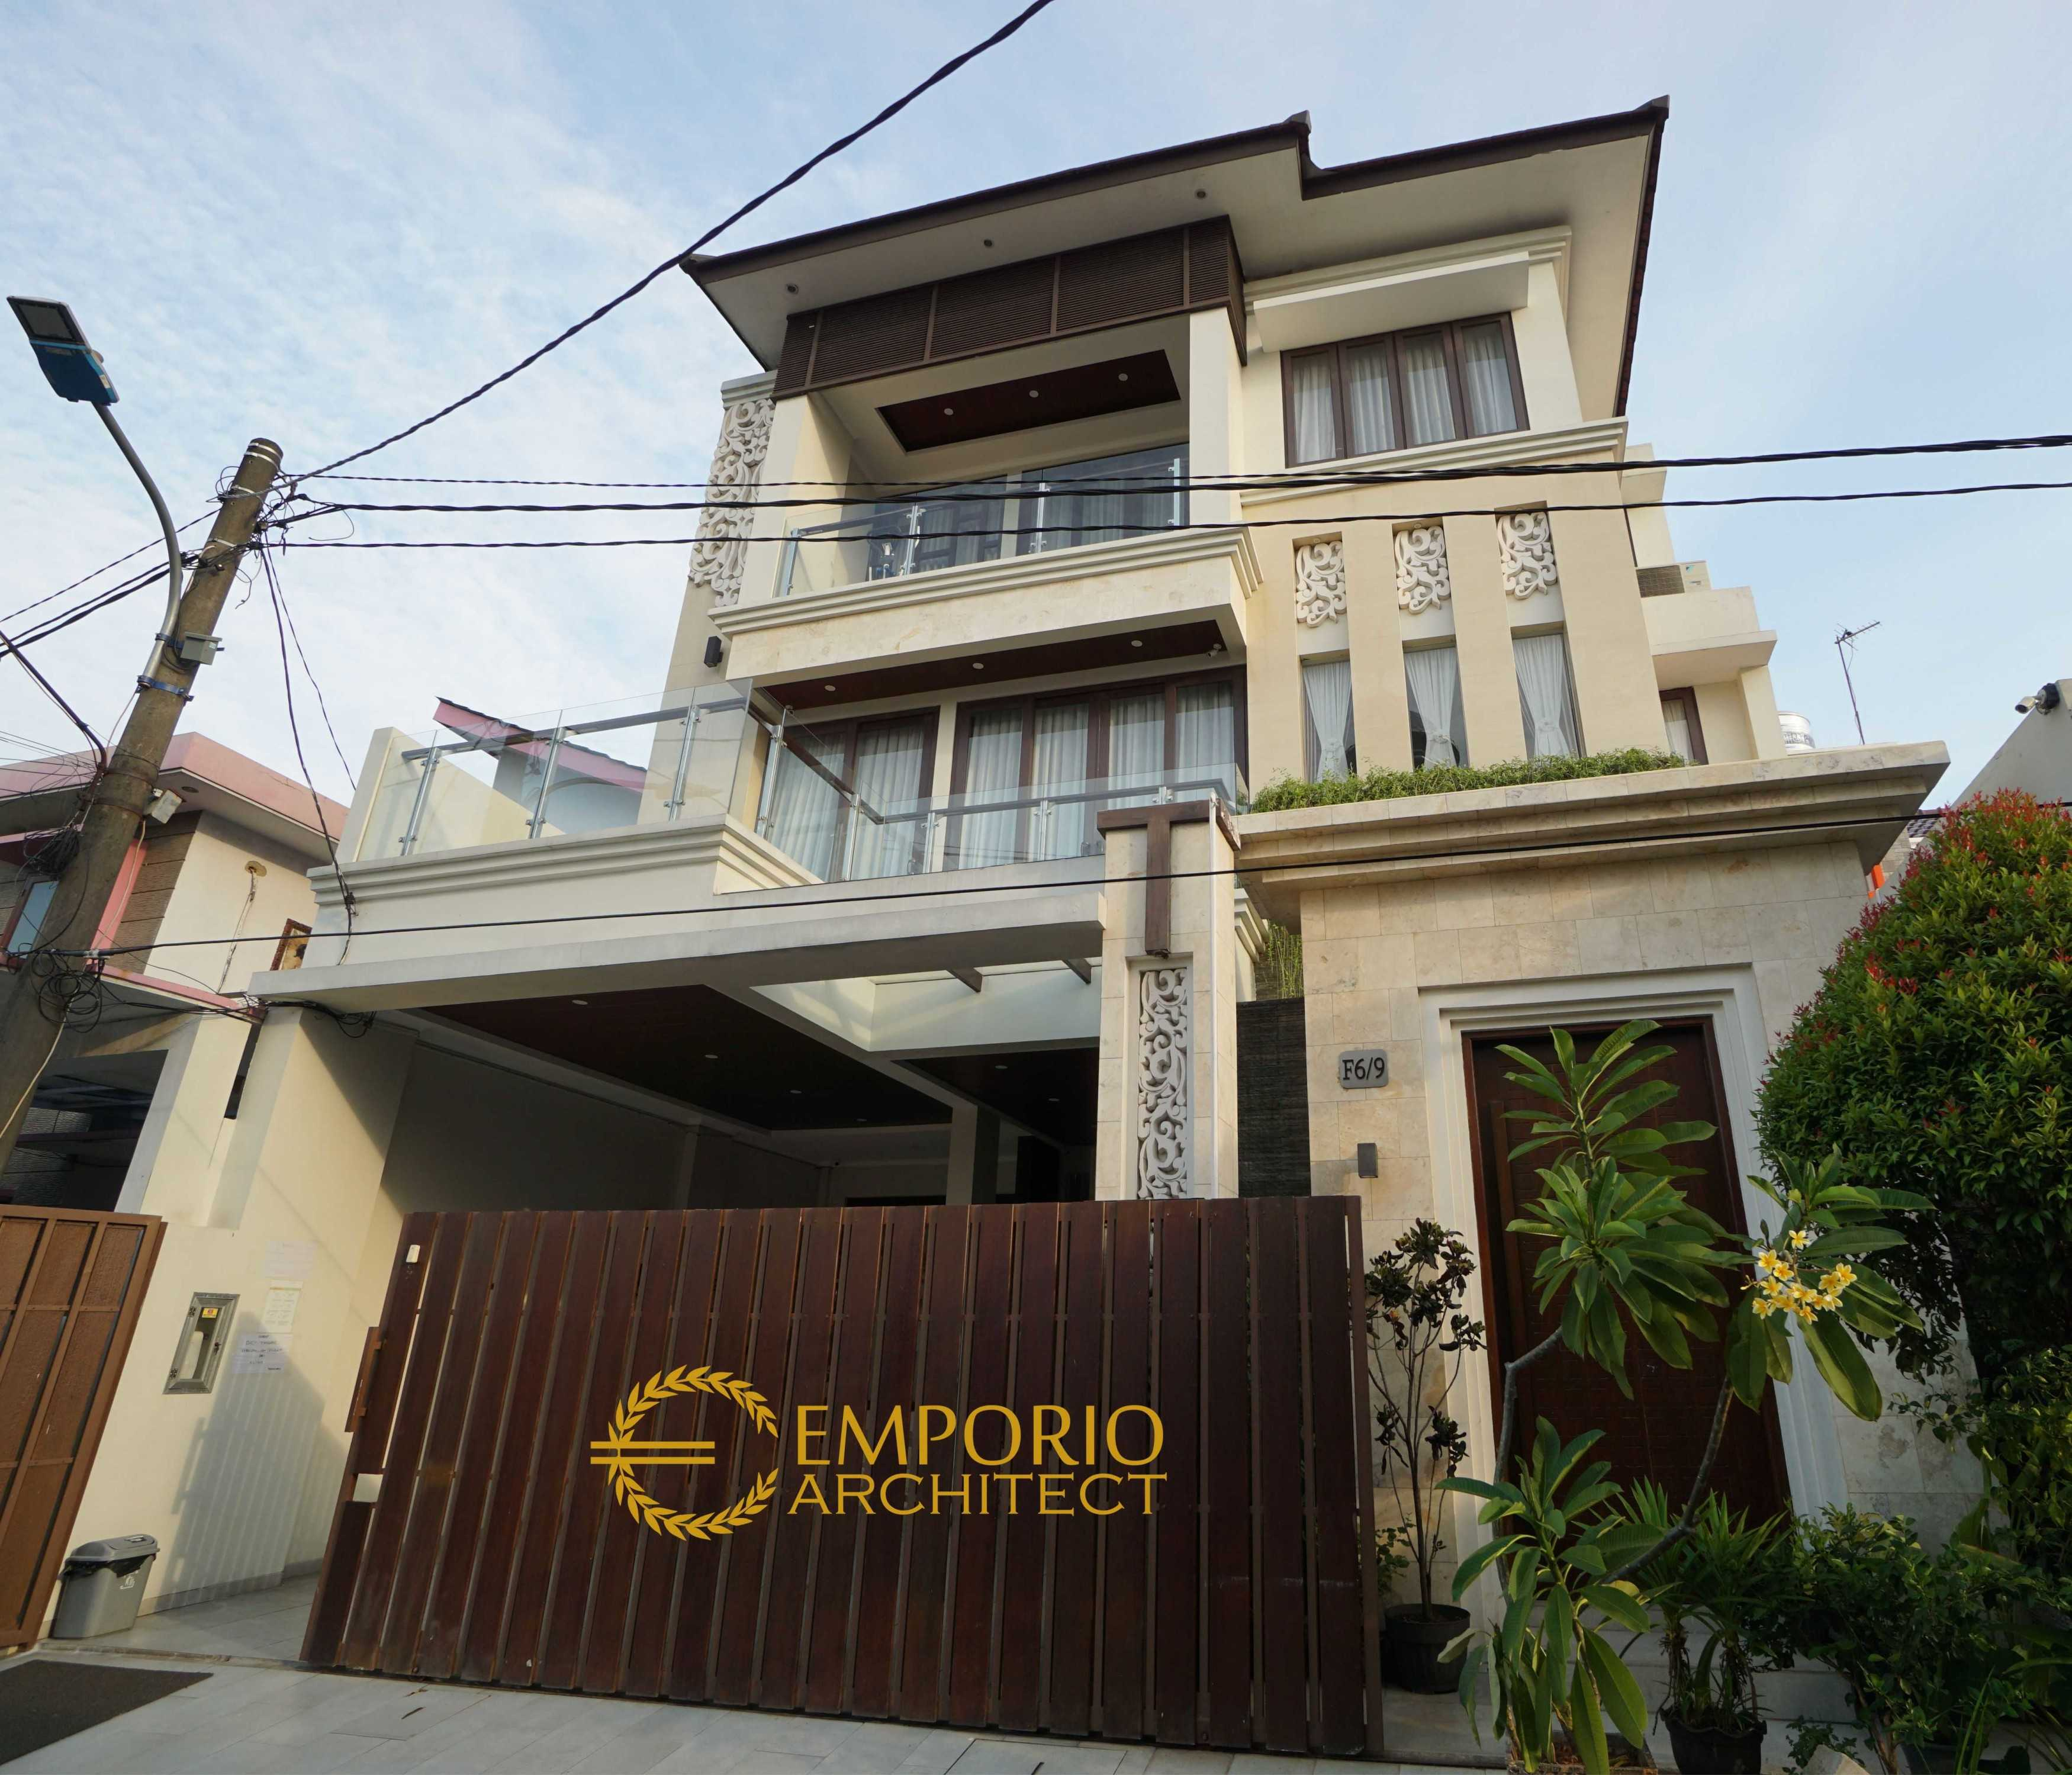 Emporio Architect Jasa Arsitek Jakarta Hasil Konstruksi Rumah Villa Bali Tropis 350 @ Jakarta Jakarta, Daerah Khusus Ibukota Jakarta, Indonesia Jakarta, Daerah Khusus Ibukota Jakarta, Indonesia Emporio-Architect-Jasa-Arsitek-Jakarta-Hasil-Konstruksi-Rumah-Villa-Bali-Tropis-350-Jakarta   94630